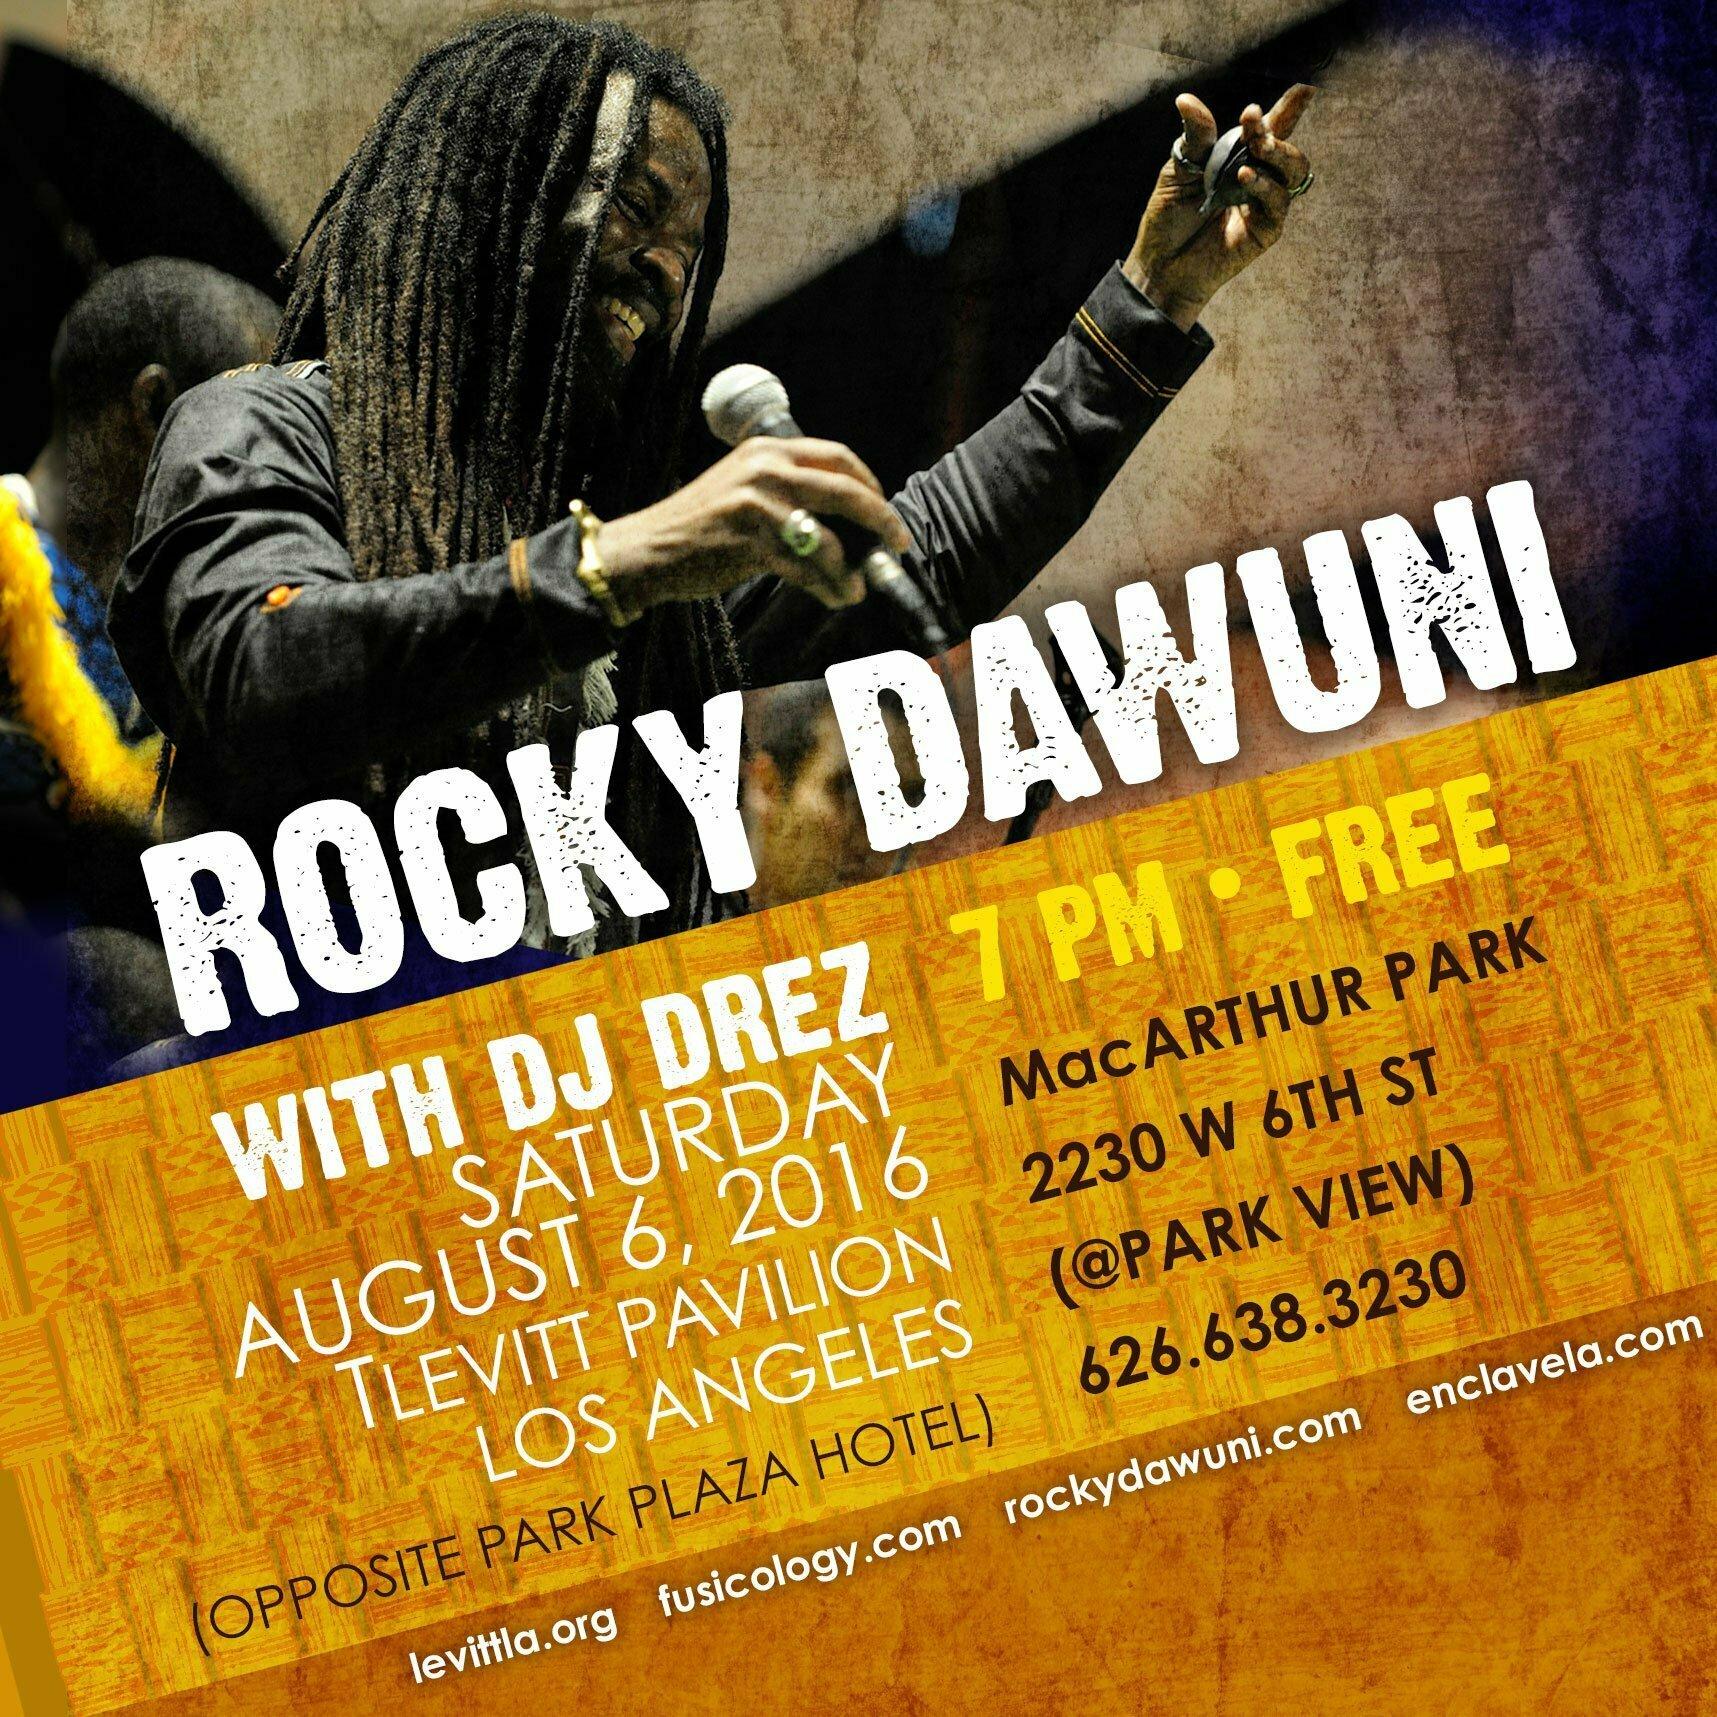 rocky-dawuni-levitt-pavilion